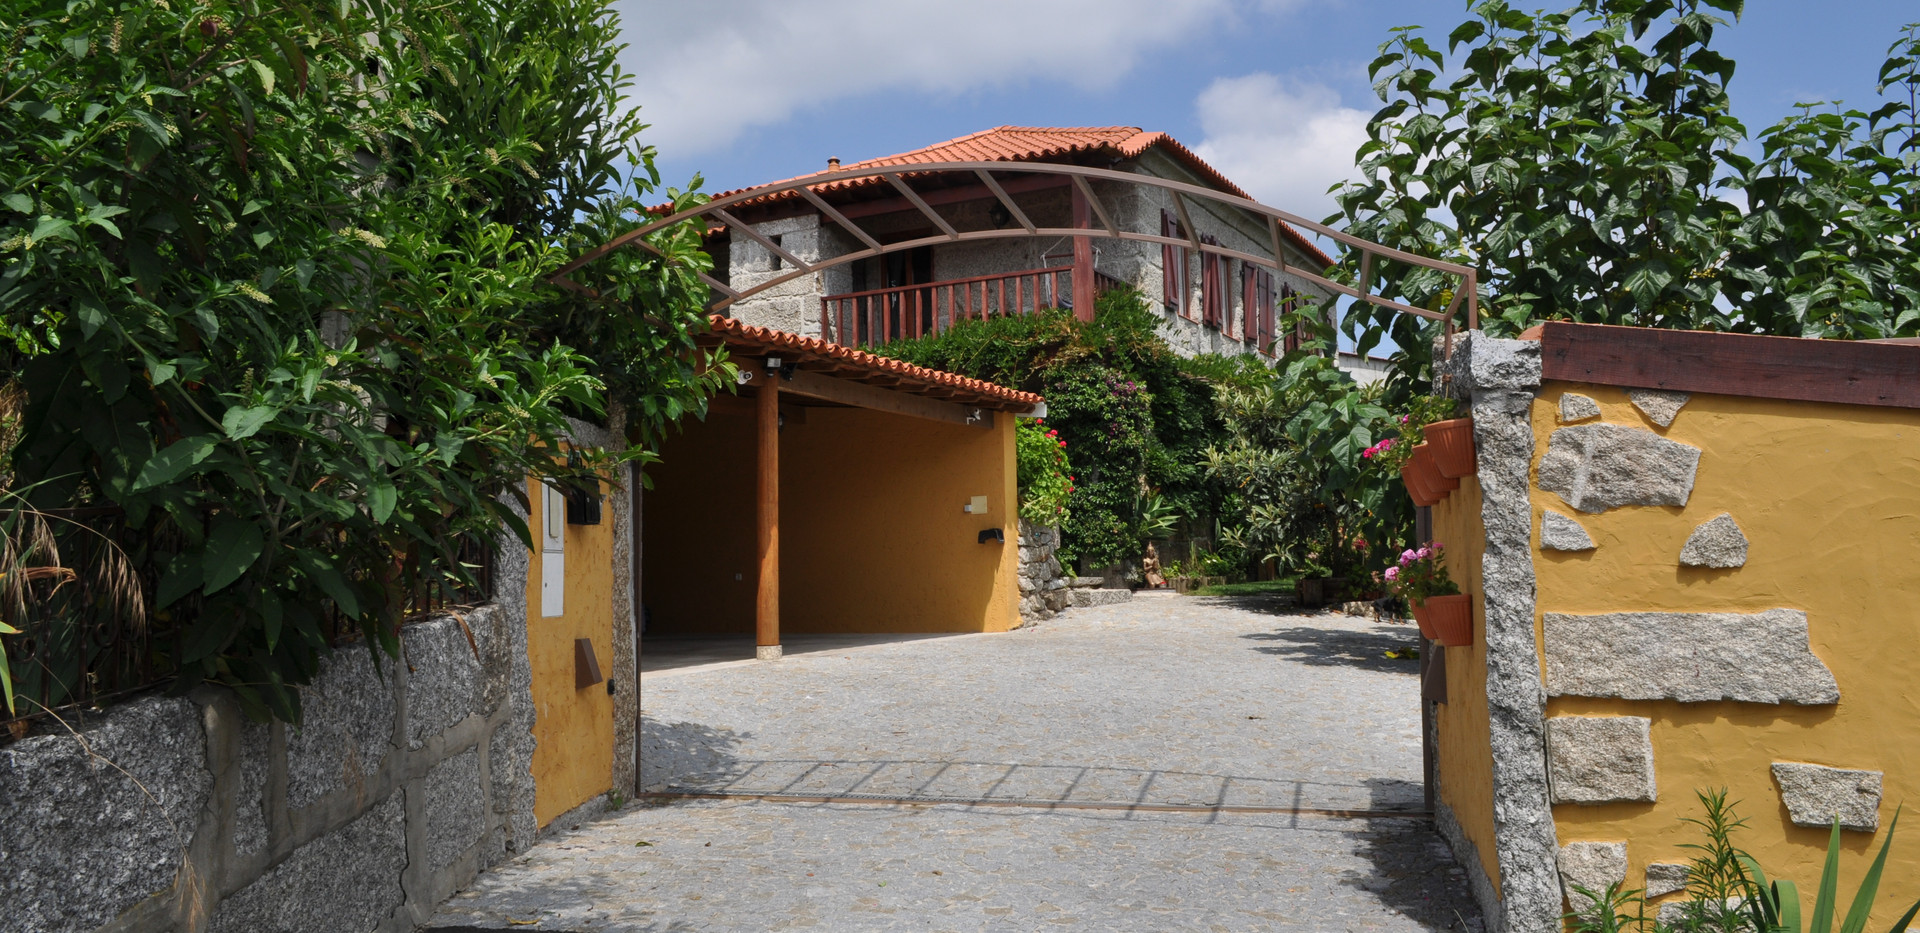 Casa da Benfeitoria